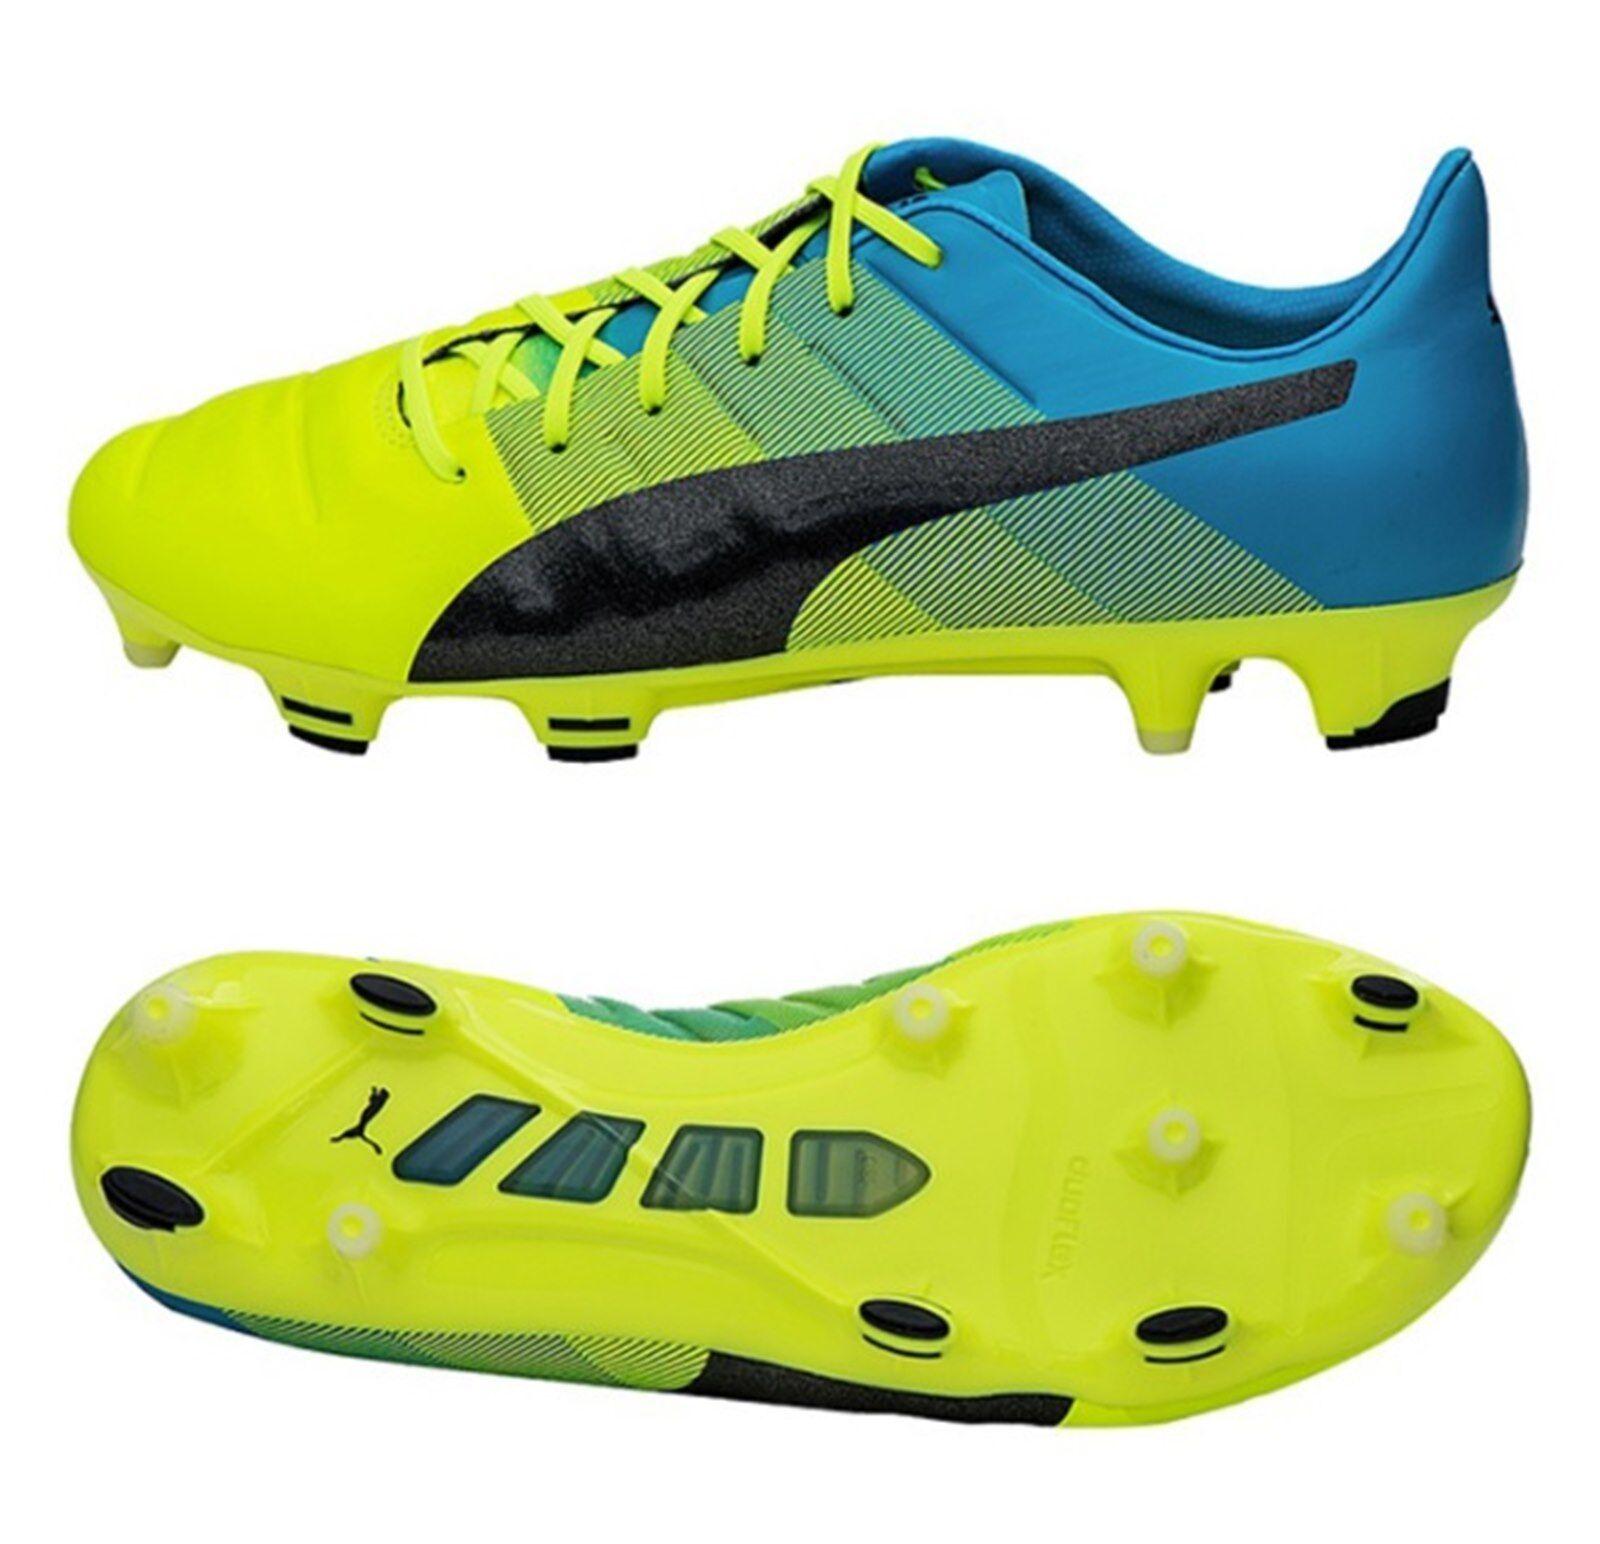 PUMA Men evo-POWER FG 1.3 FG evo-POWER Cleats Gelb Soccer Football Schuhes Spike 103524-01 b51aae